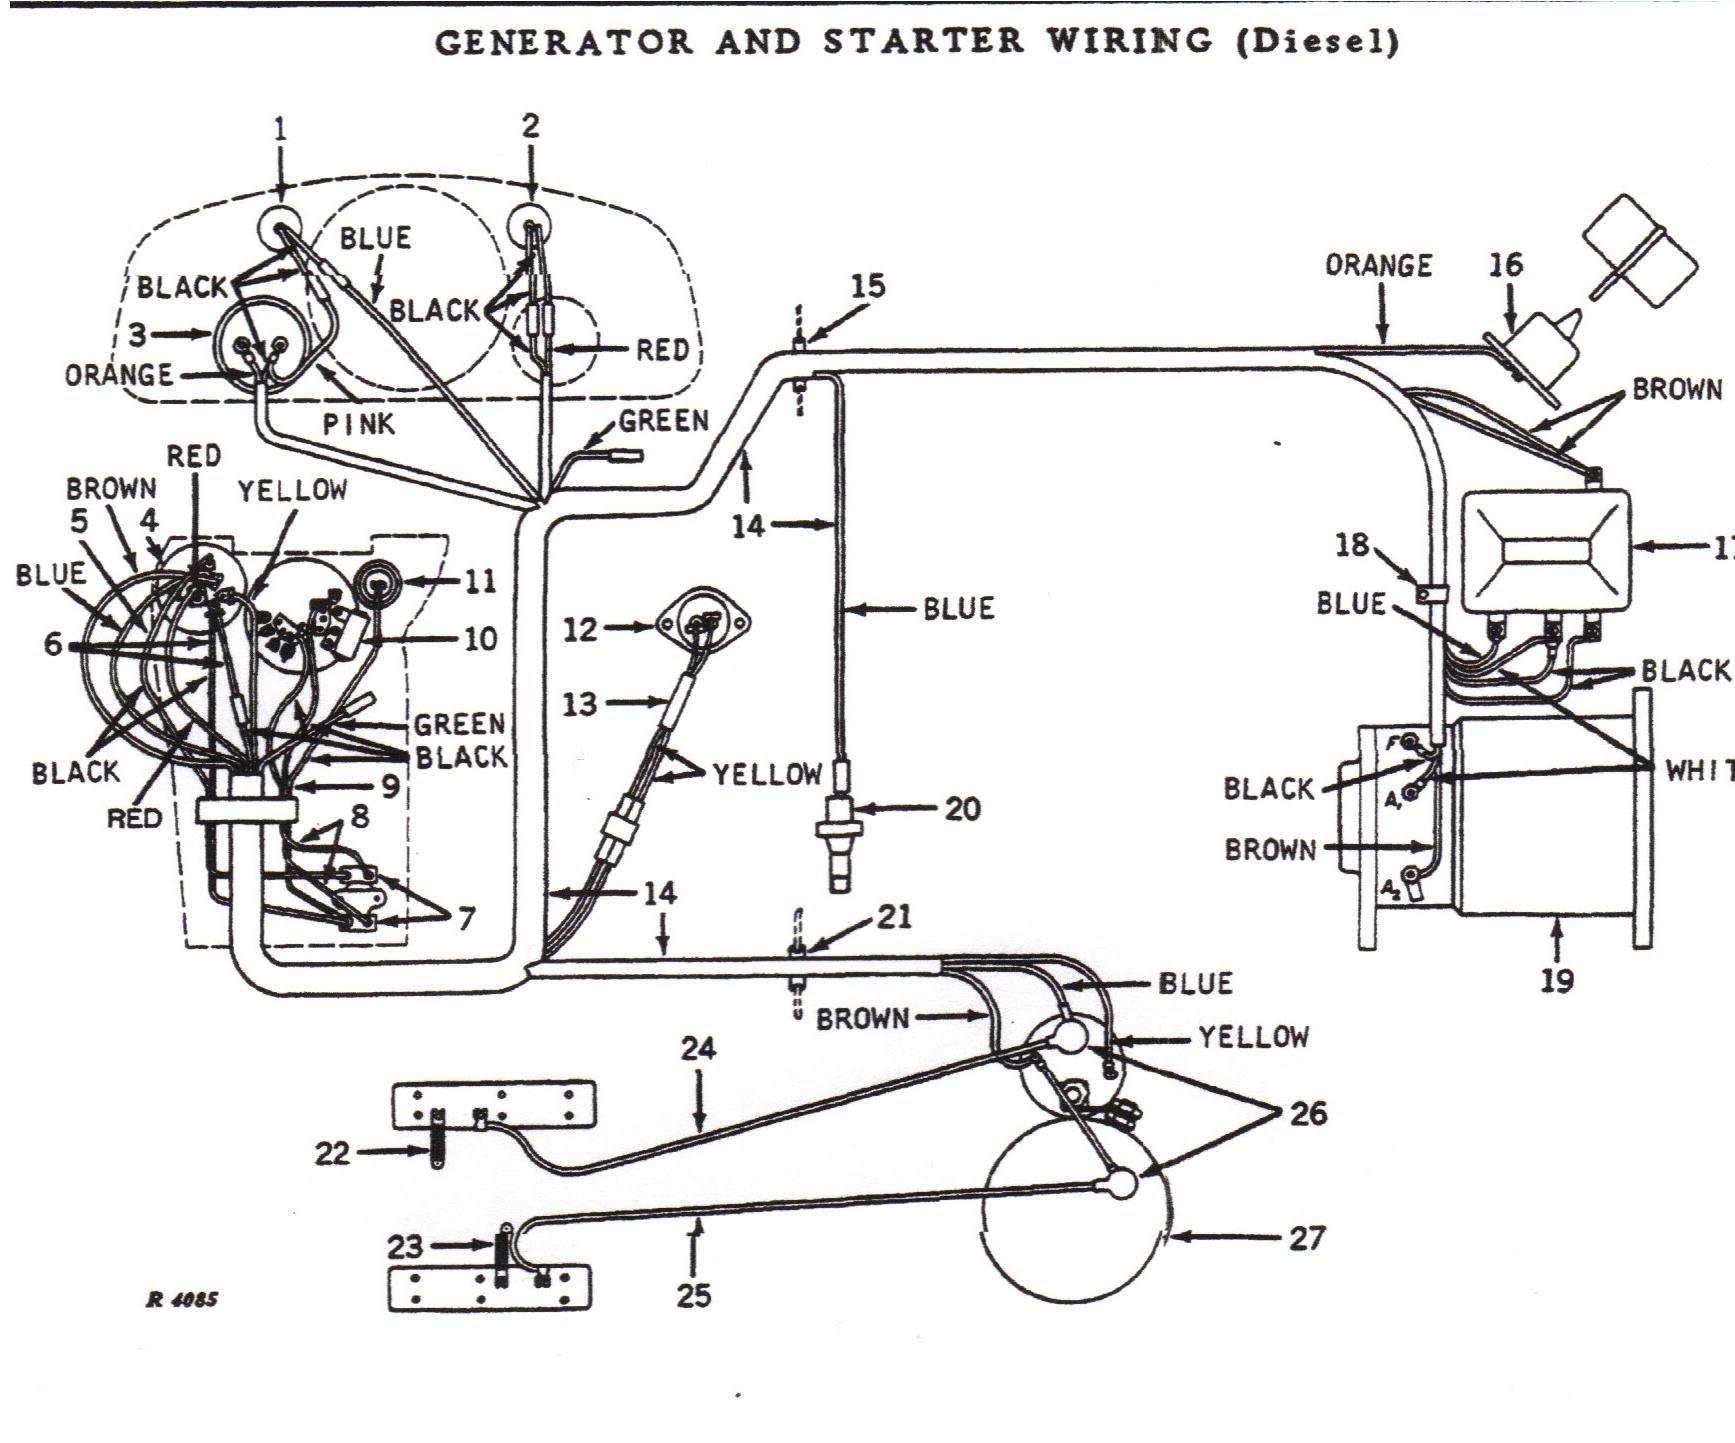 Diagram Starter 4020 24 Volt System Wiring Diagram Full Version Hd Quality Wiring Diagram Diagramkraush Merz Spezial It